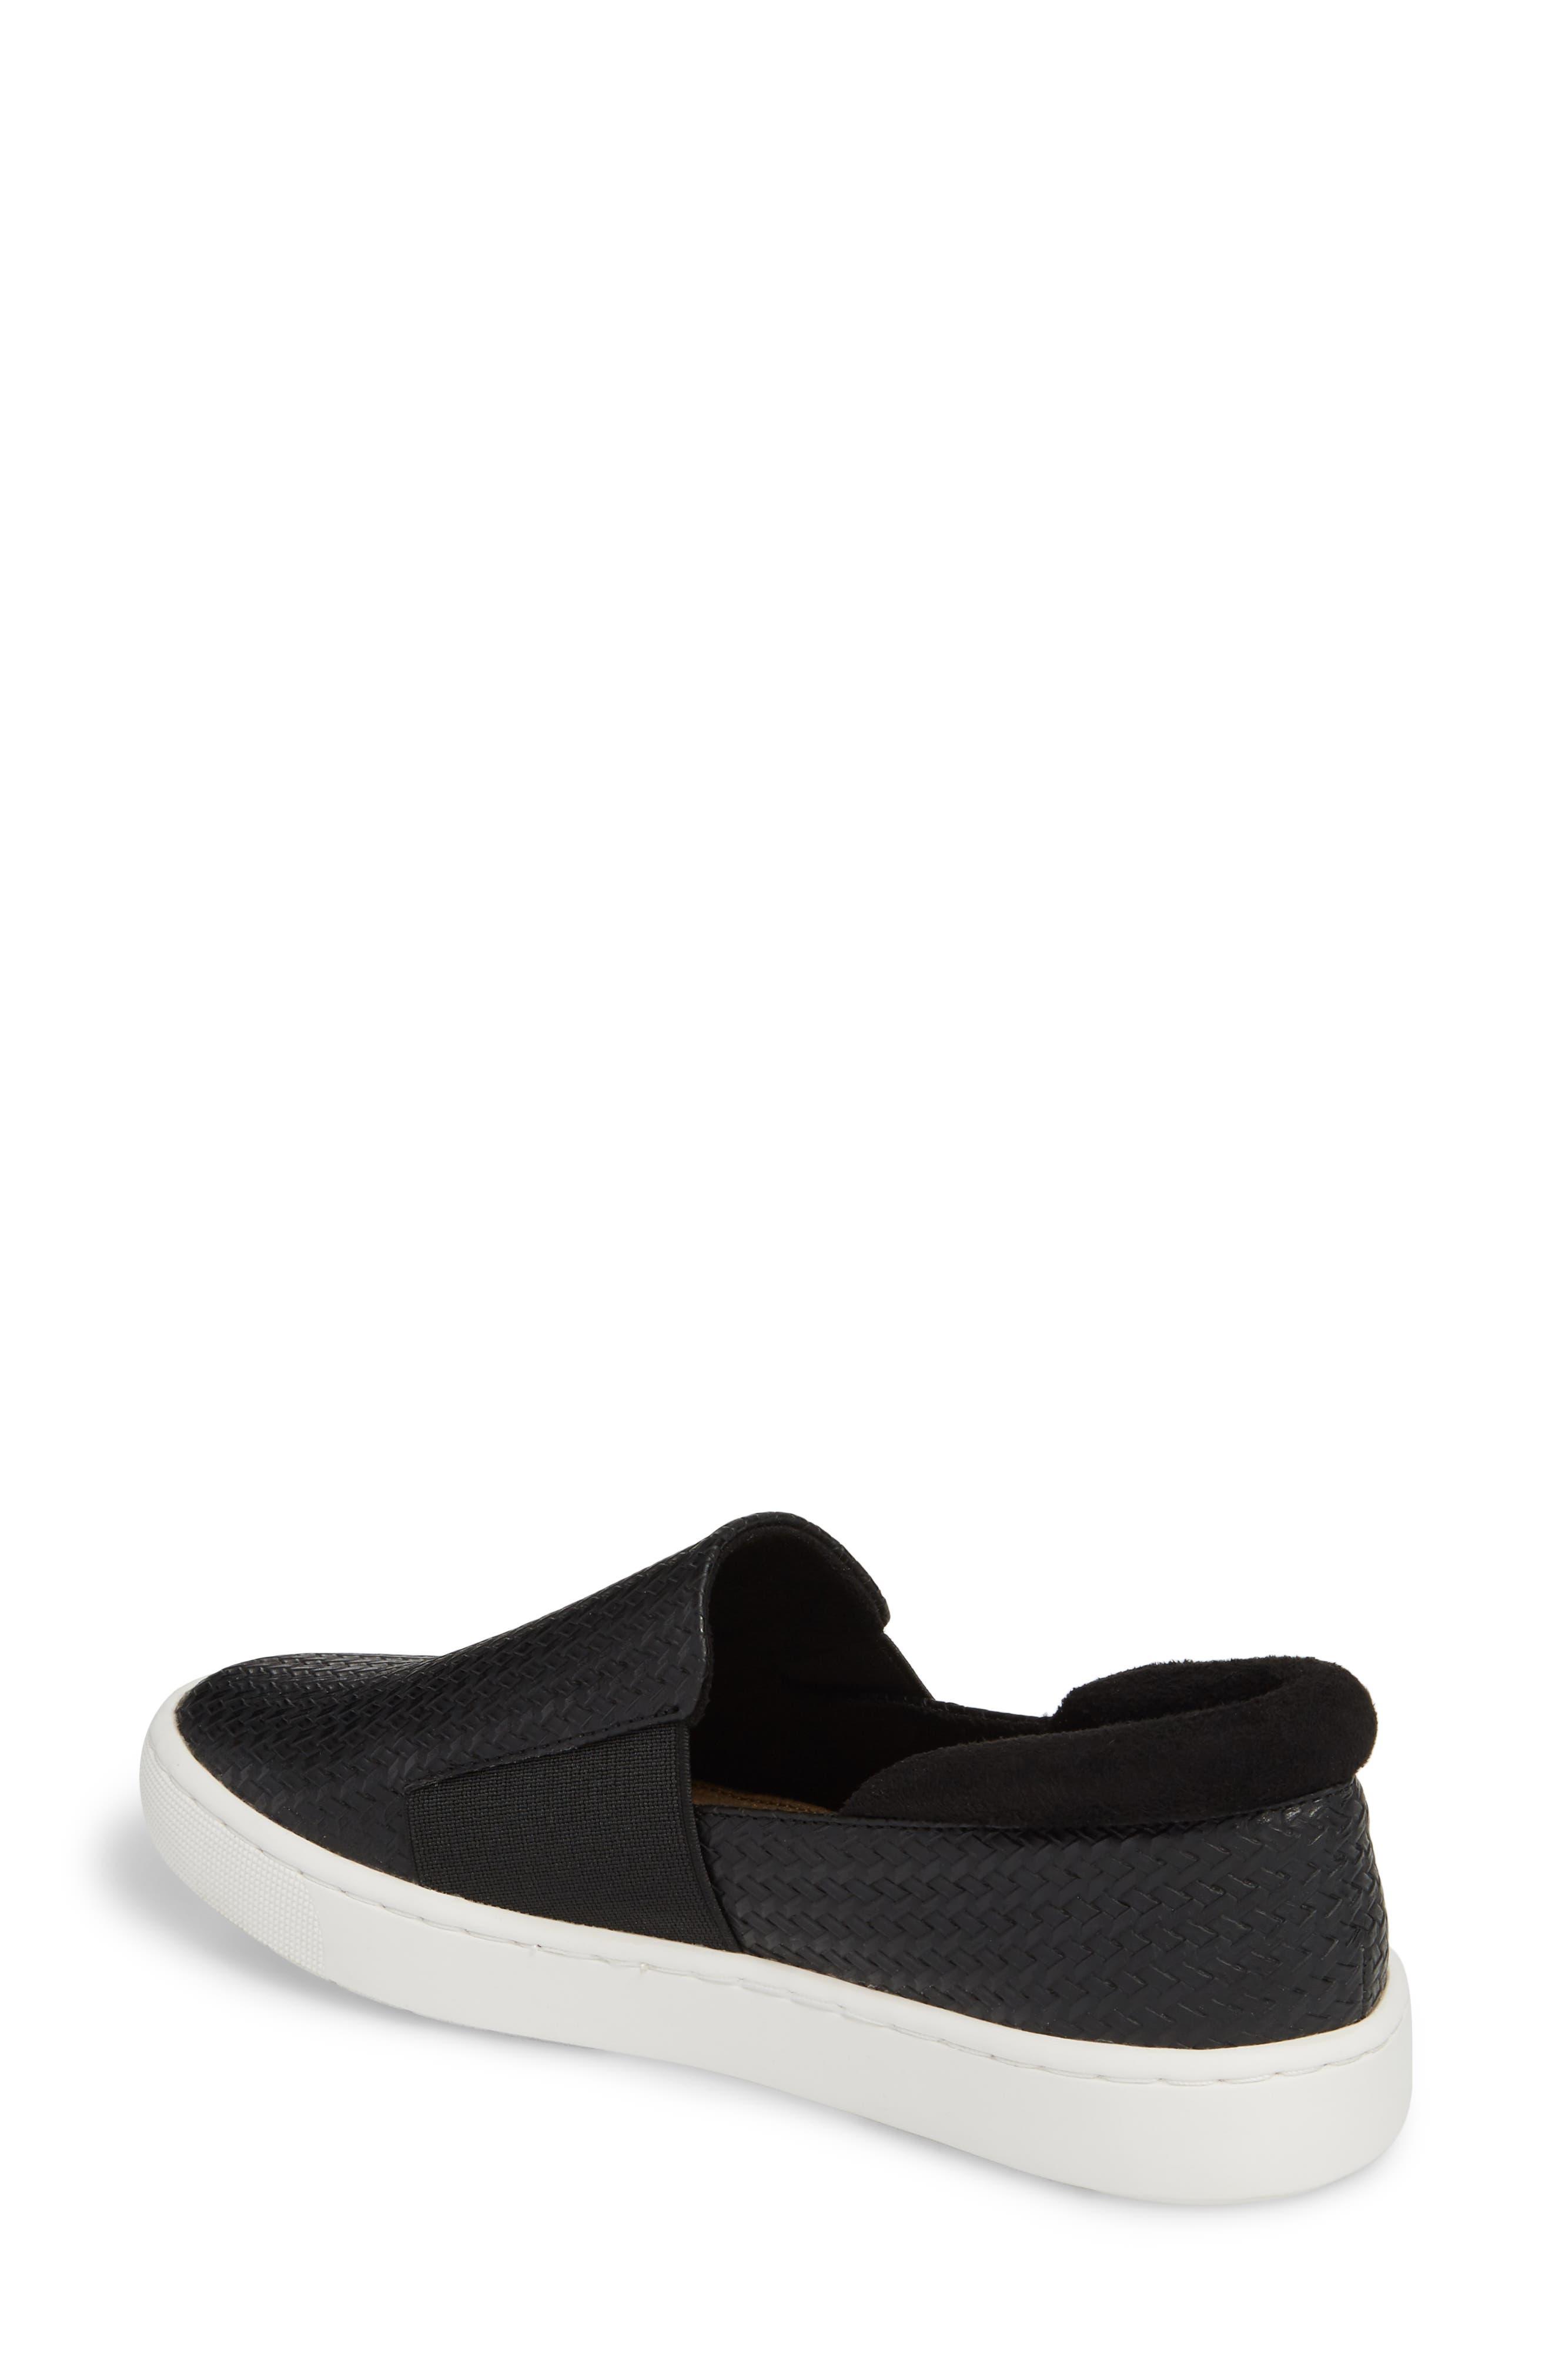 BELLA VITA, Ramp II Slip-On Sneaker, Alternate thumbnail 2, color, BLACK FABRIC